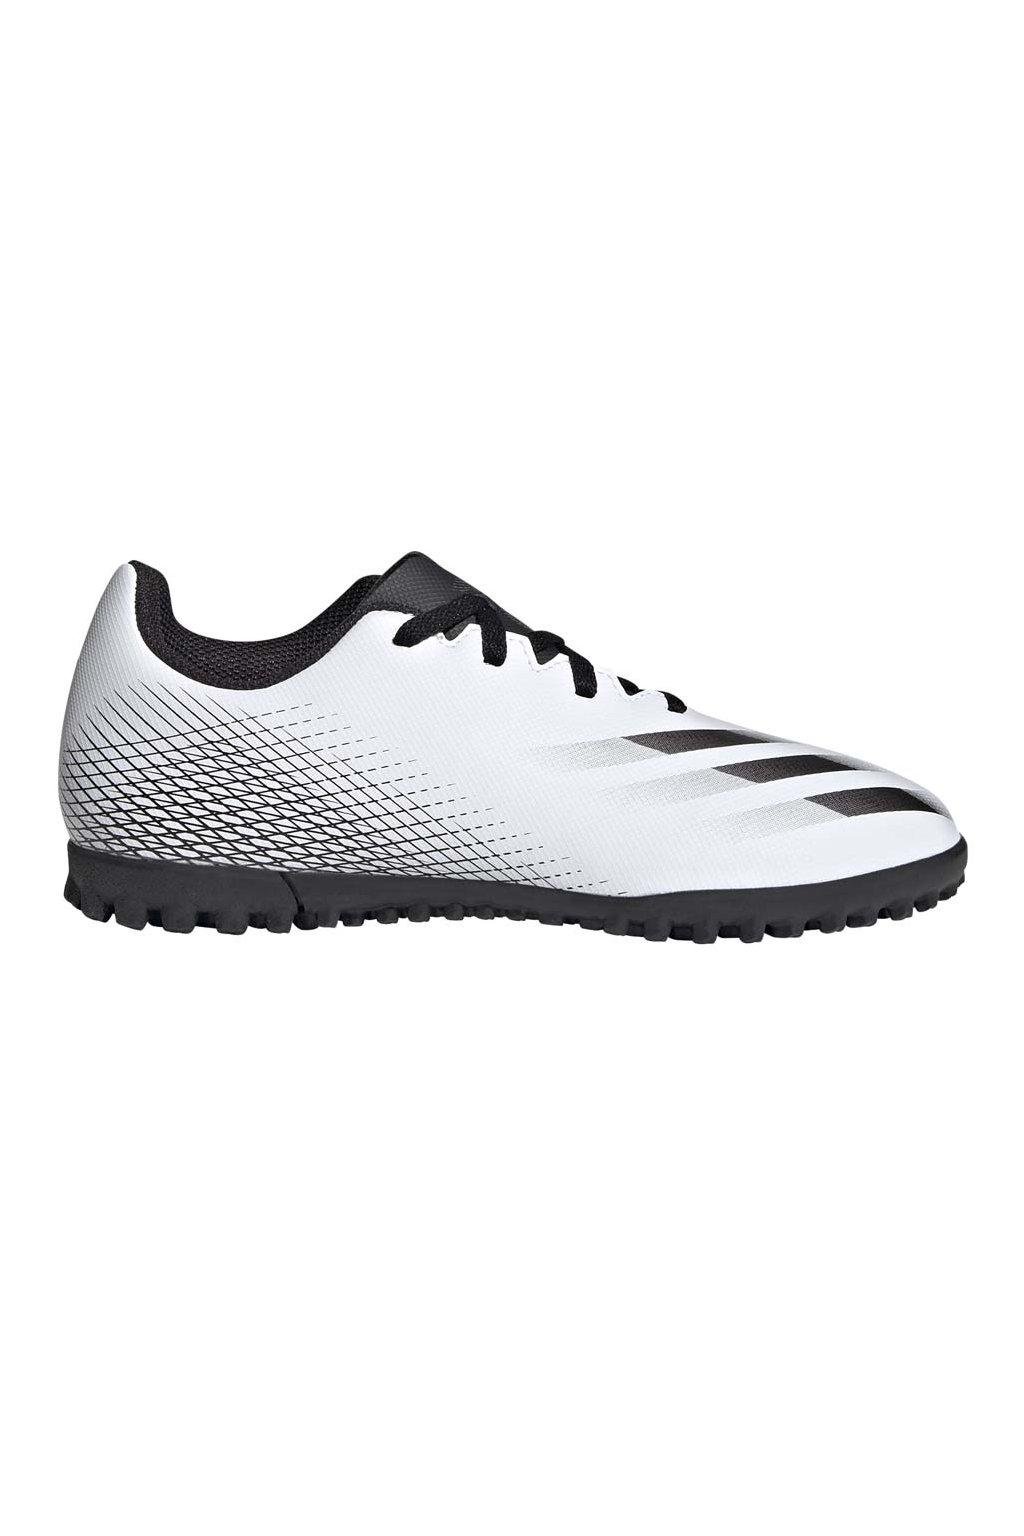 Futbalové kopačky Adidas X GHOSTED.4 TF JUNIOR FW6801